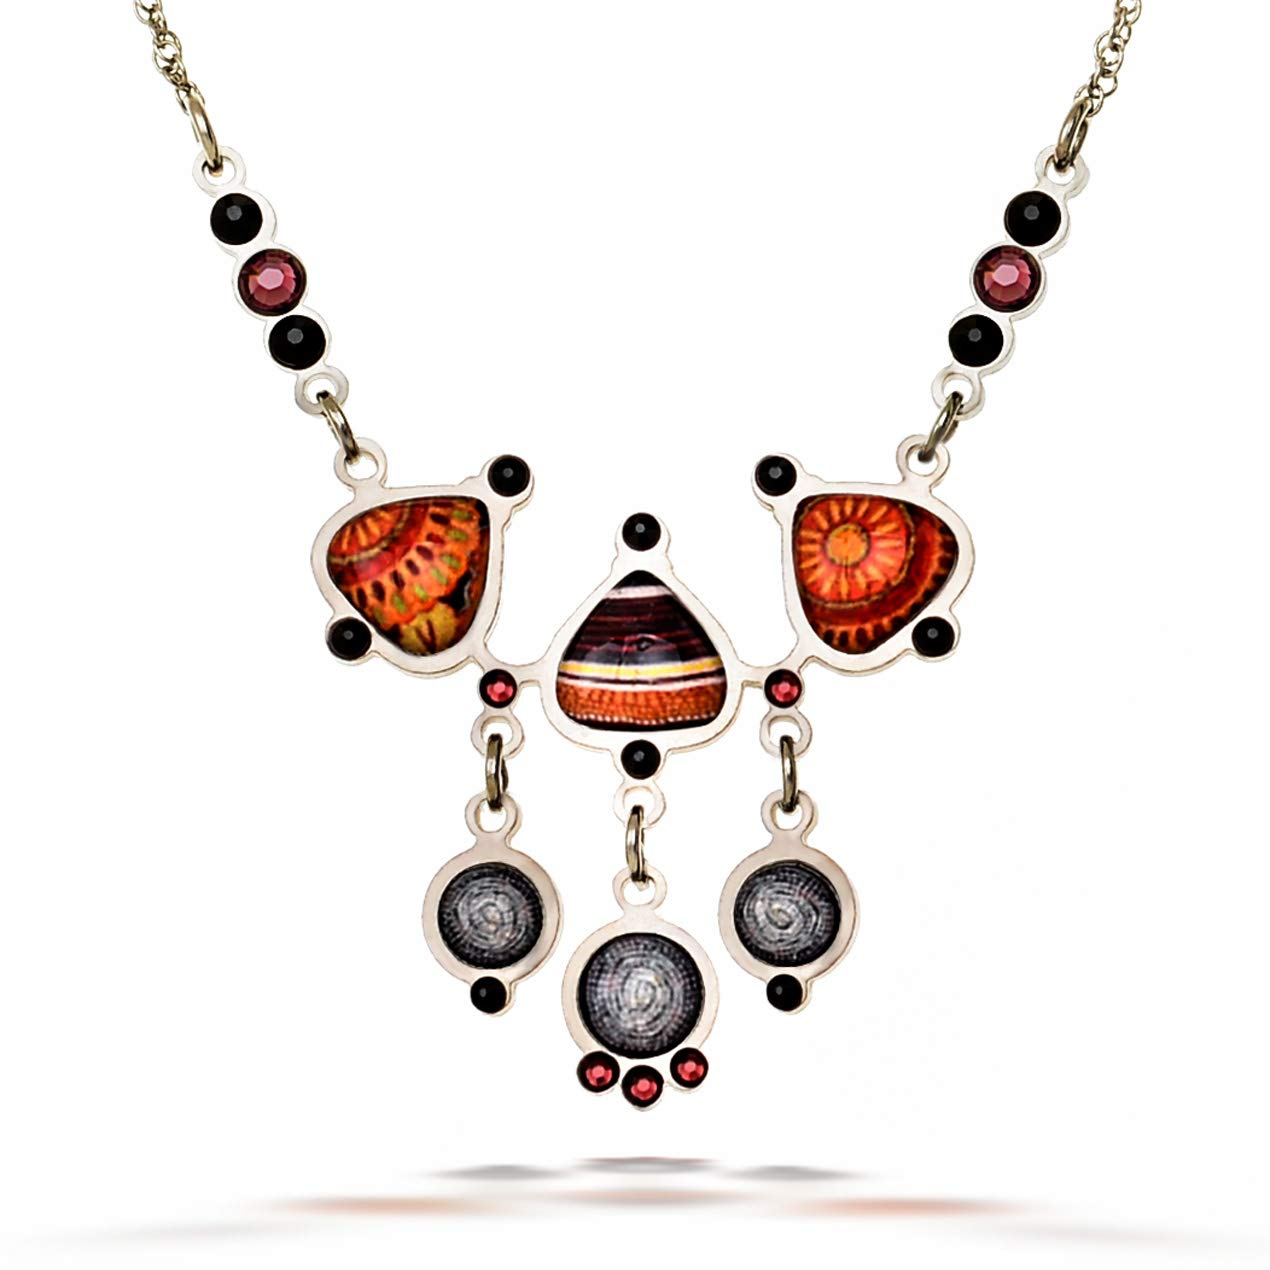 Artazia Burnt Orange and Brown Tones African Motif Zulu Fashion Necklace N5708